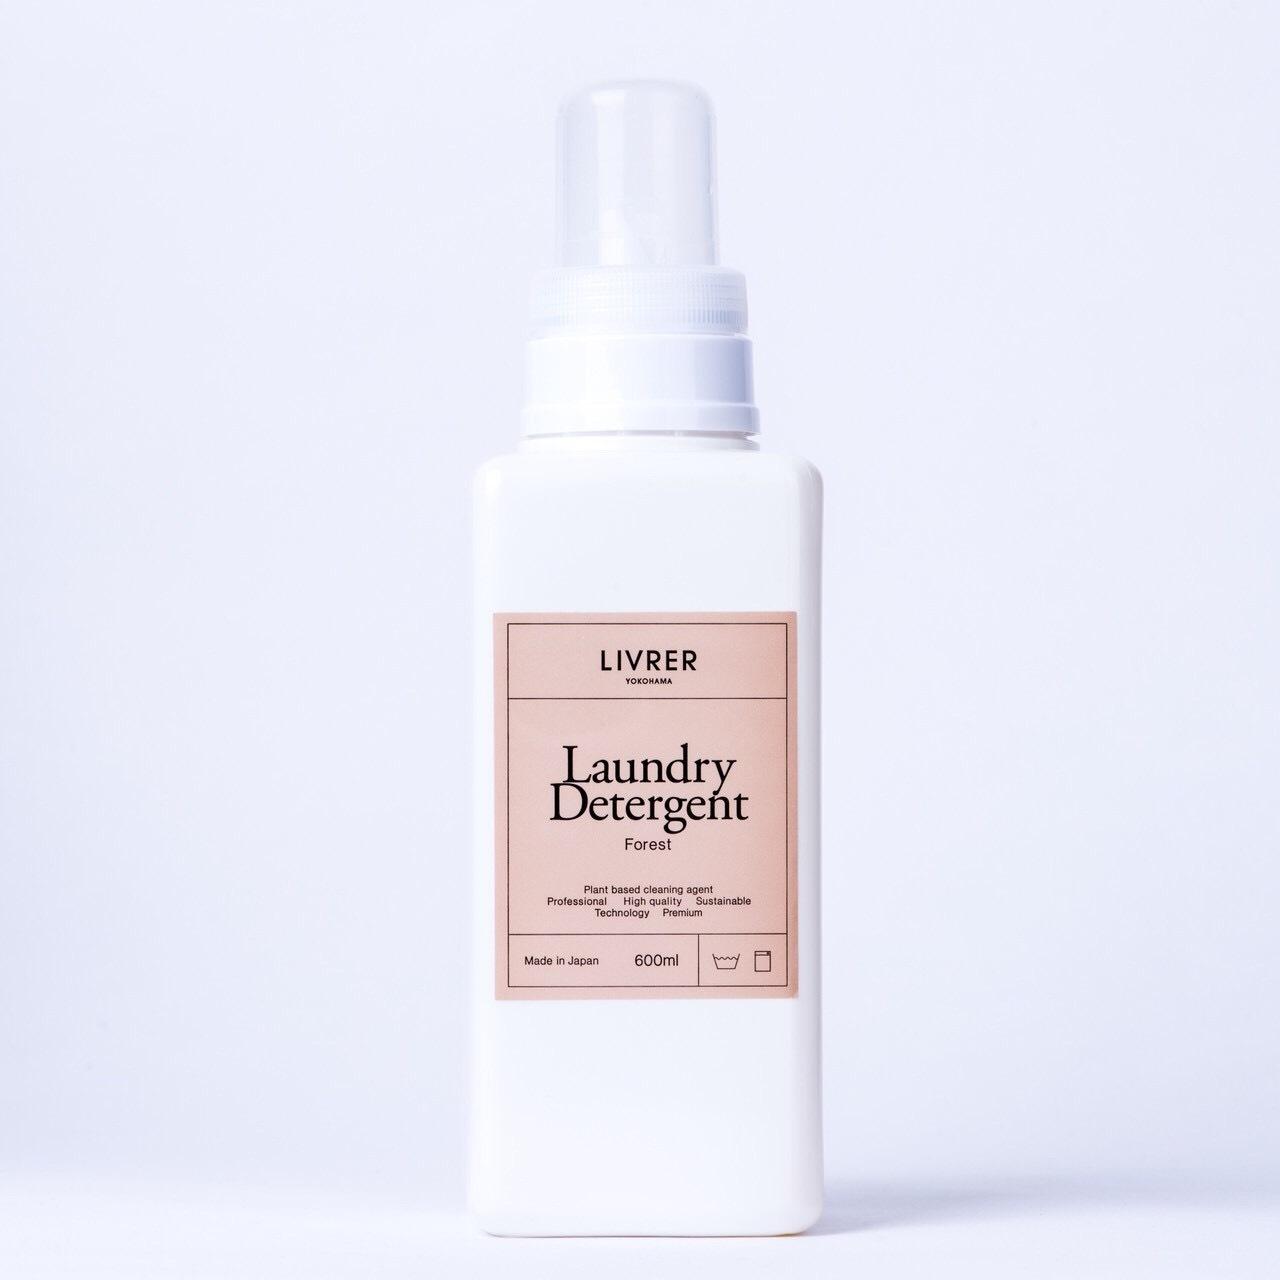 600ml】フォレスト 洗濯用洗剤 /Landry Detergent ▶Forest <綿、麻、合成繊維用>